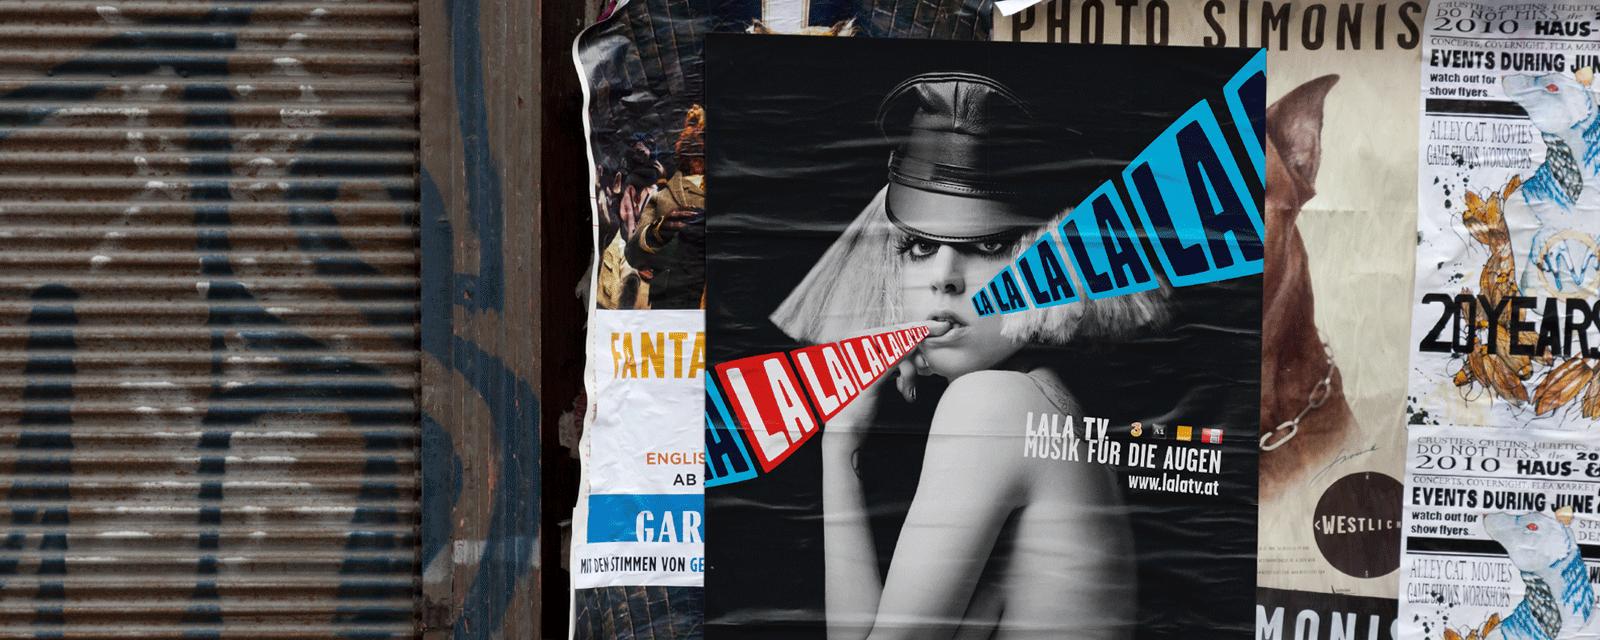 LaLa TV - Lady Gaga